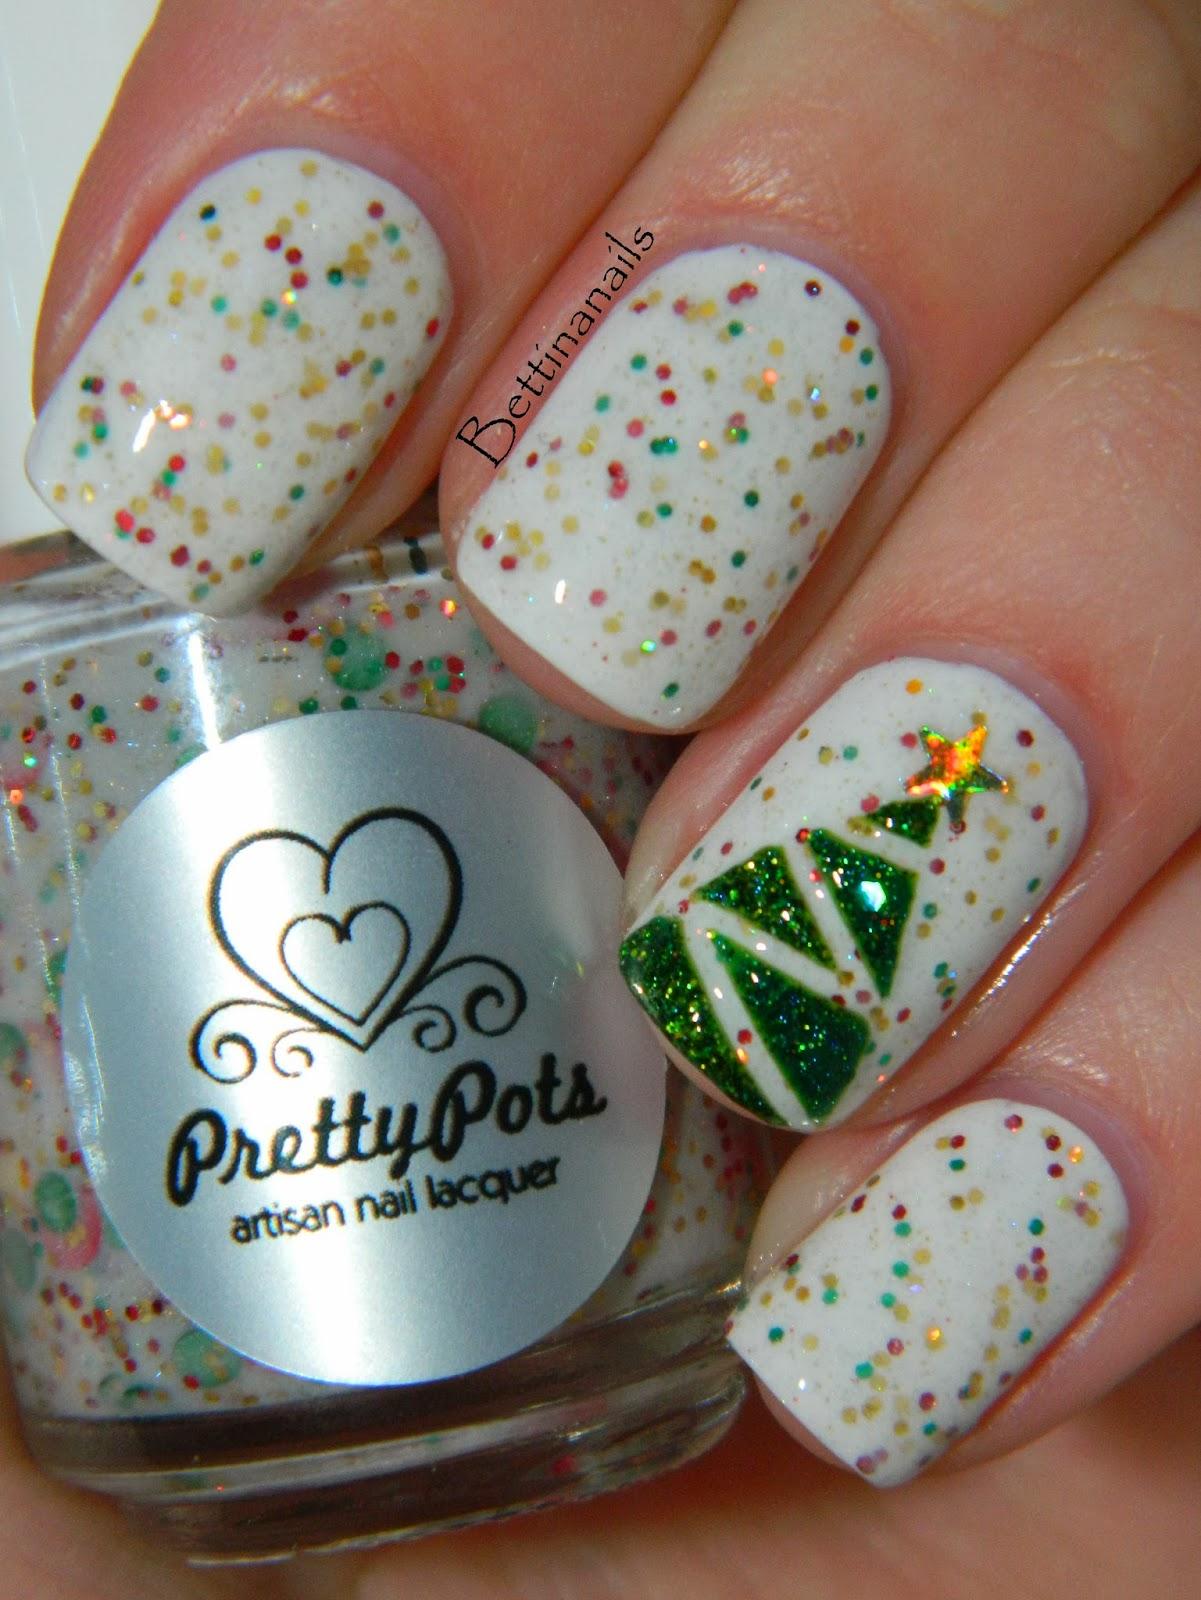 Bettina Nails: Getting into the Christmas Spirit